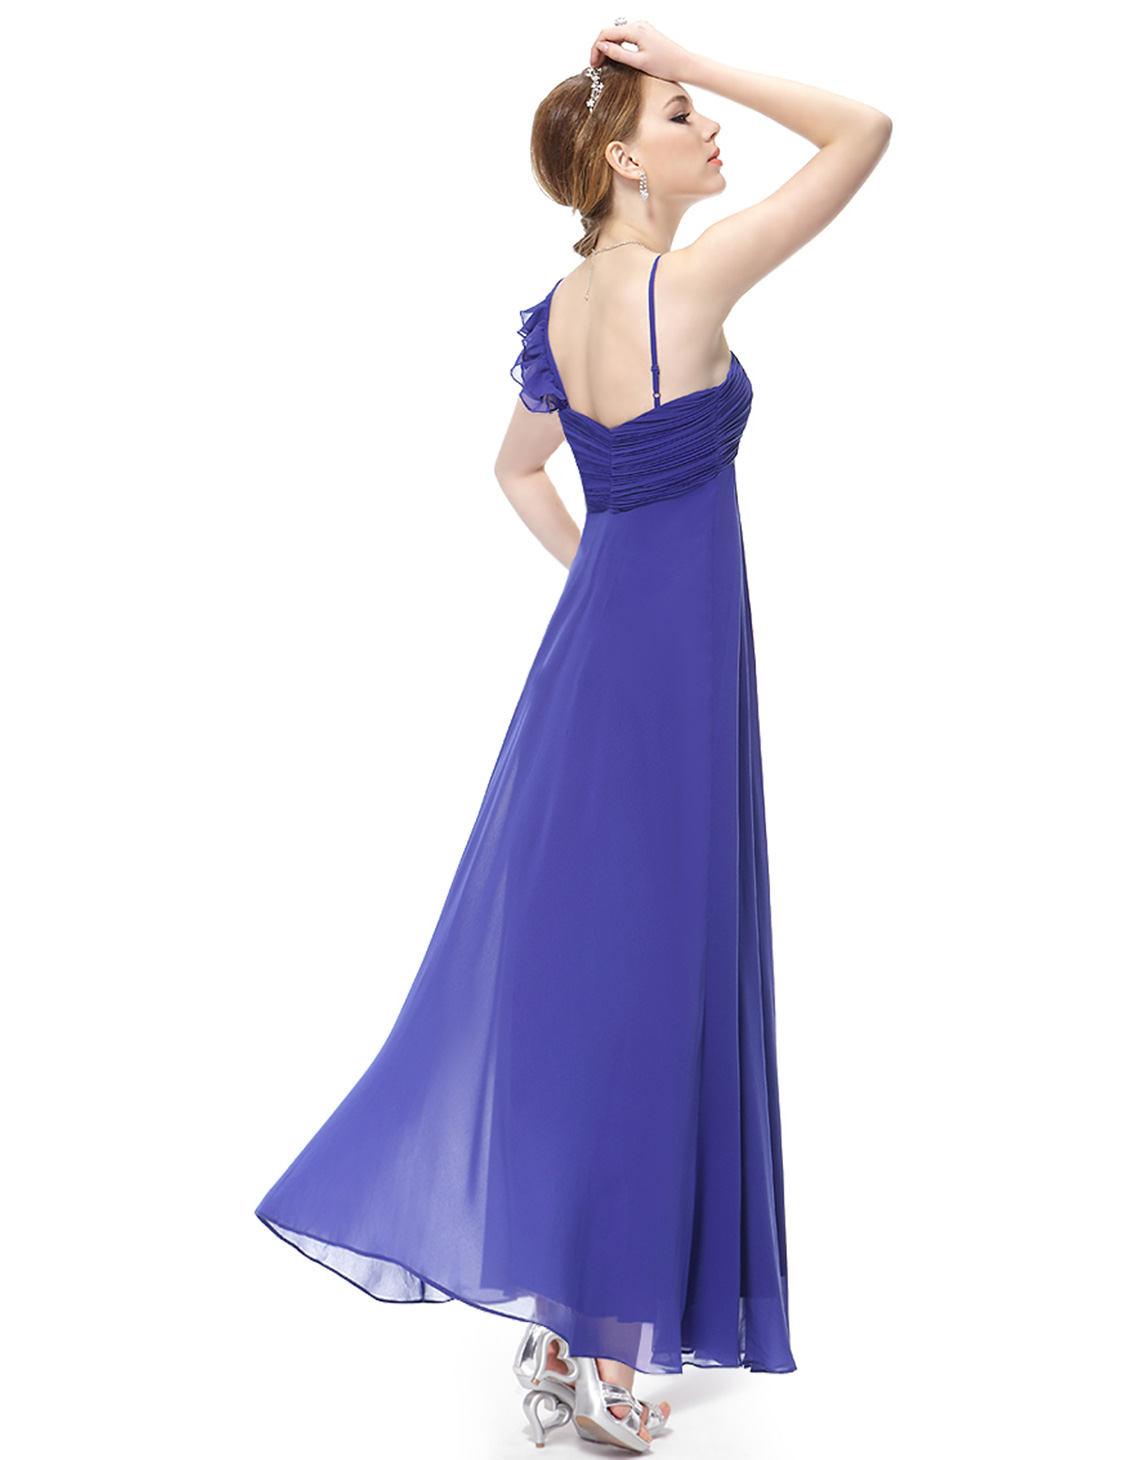 Designer Wedding Gowns Ebay - Discount Wedding Dresses